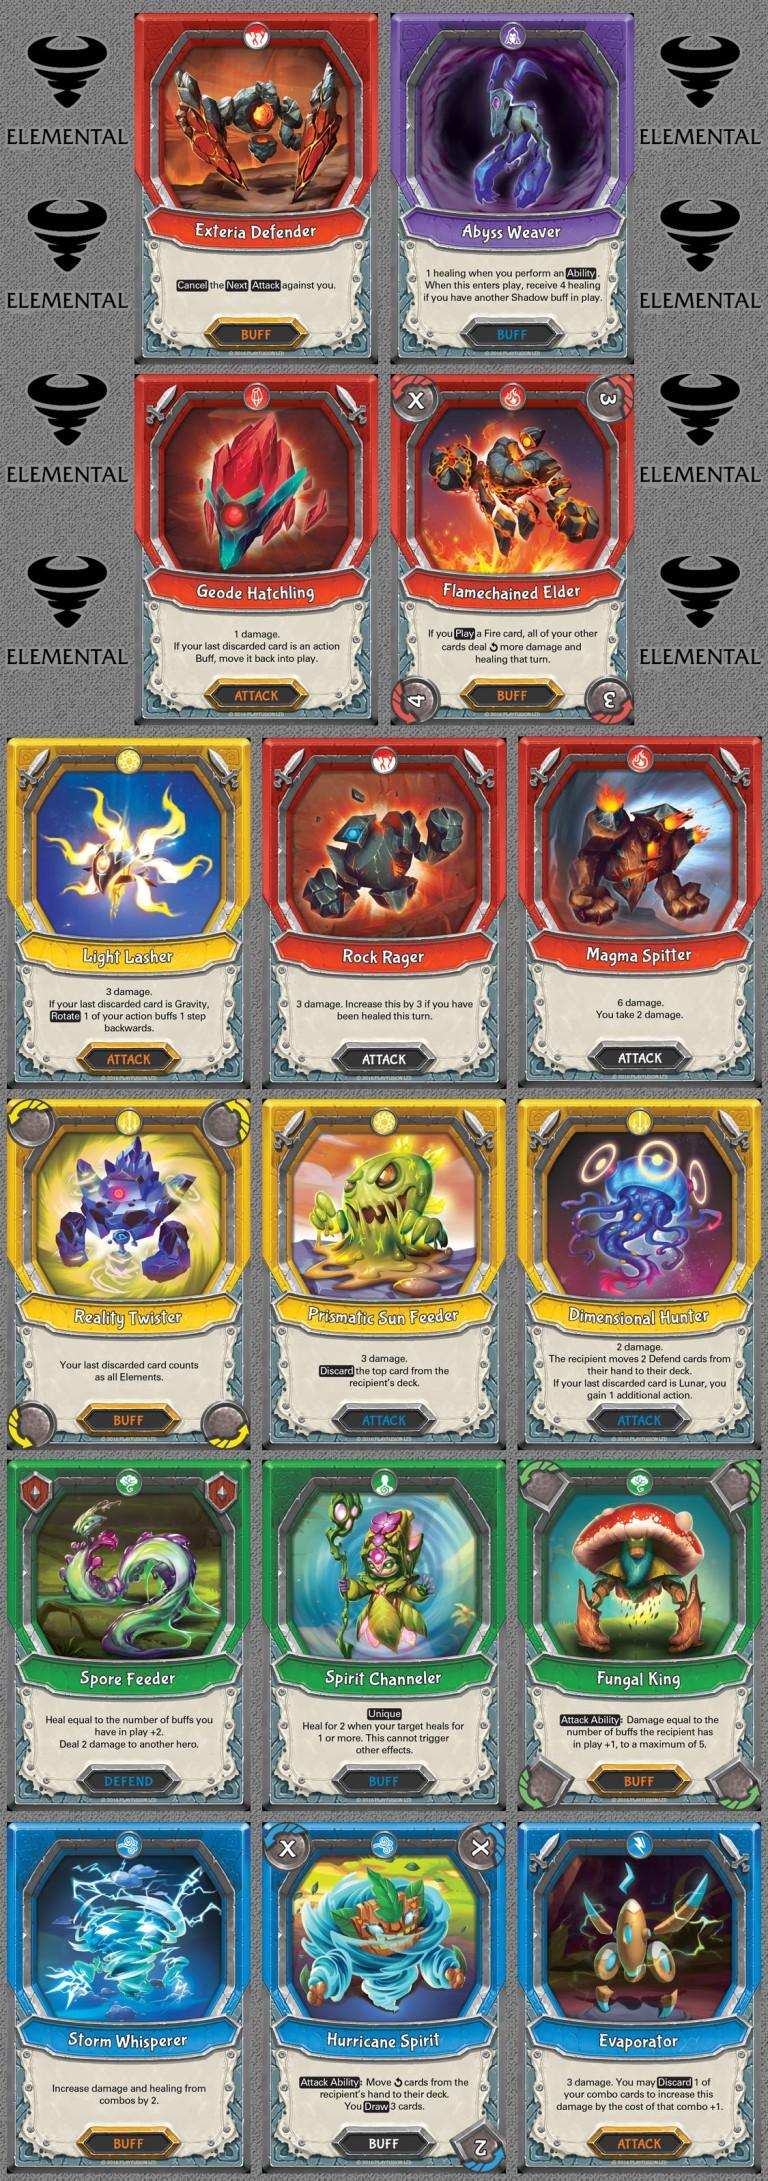 Elemental Cards